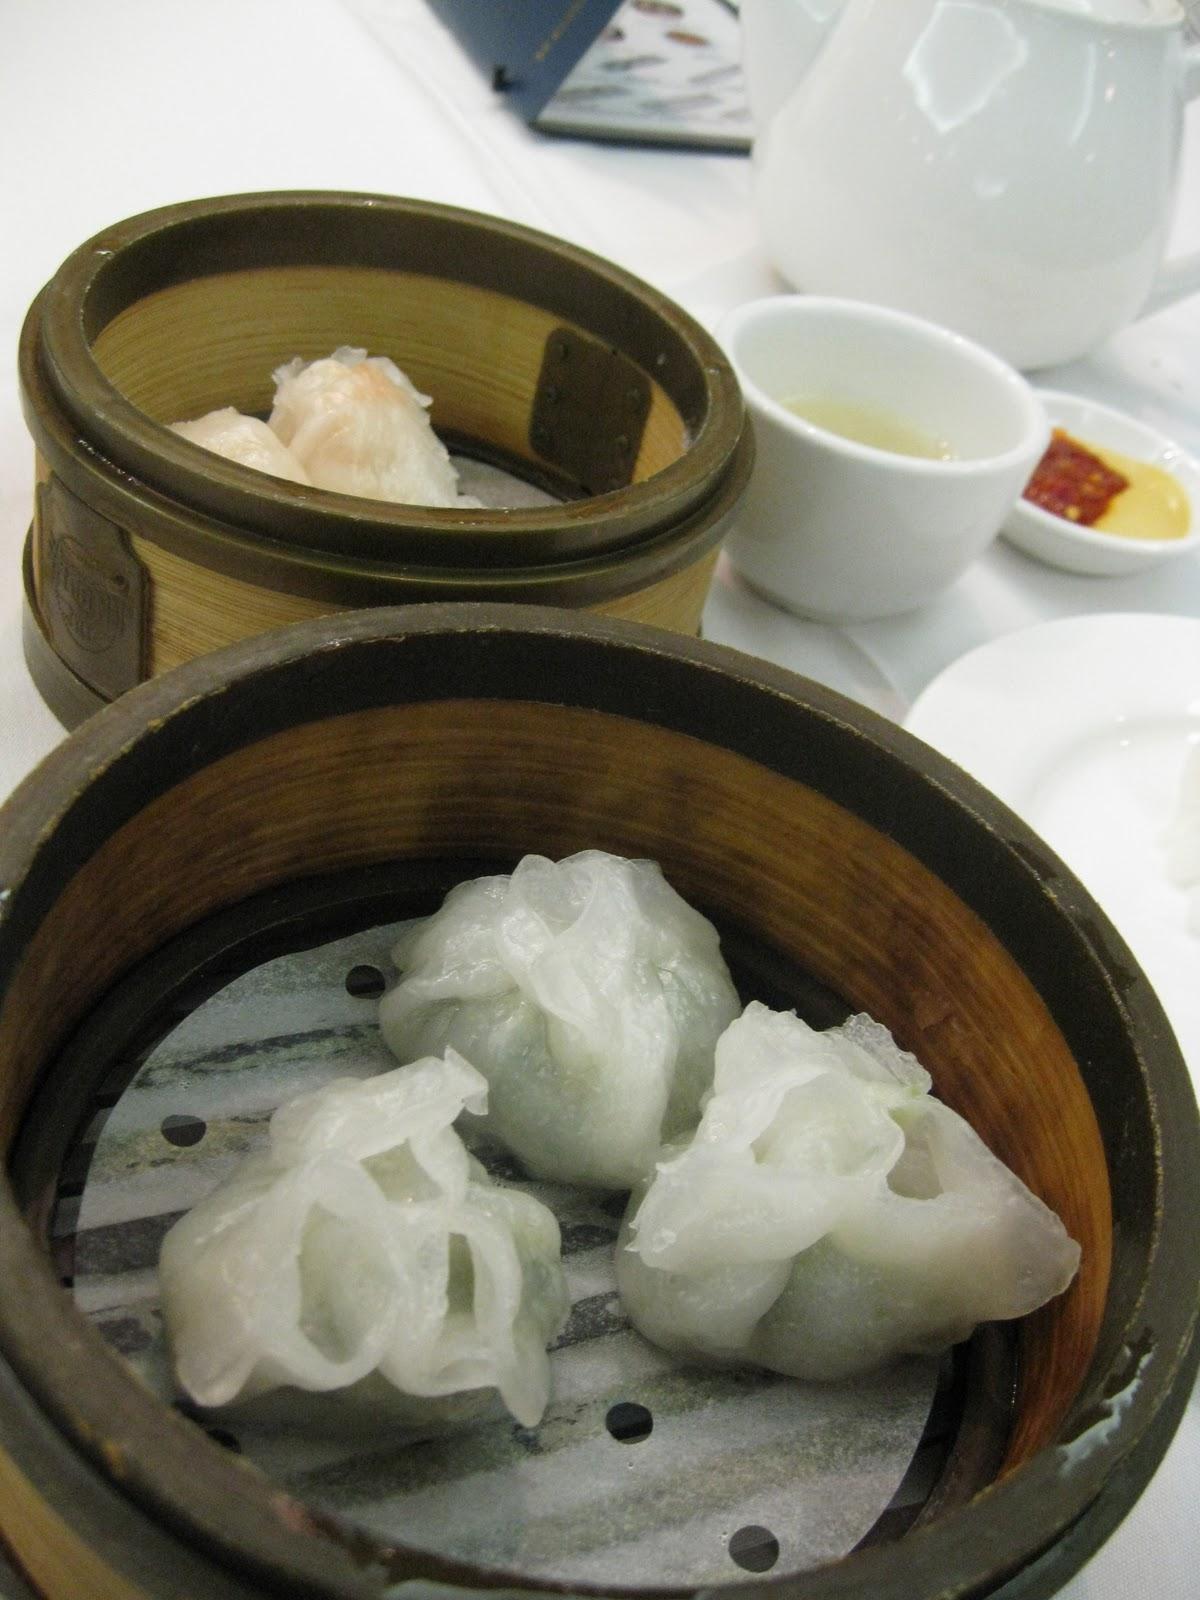 http://2.bp.blogspot.com/_TYv9kgX4Muo/TOGD8-JX8_I/AAAAAAAAAMo/CR_vTWH5onM/s1600/dumplings+spread.jpg